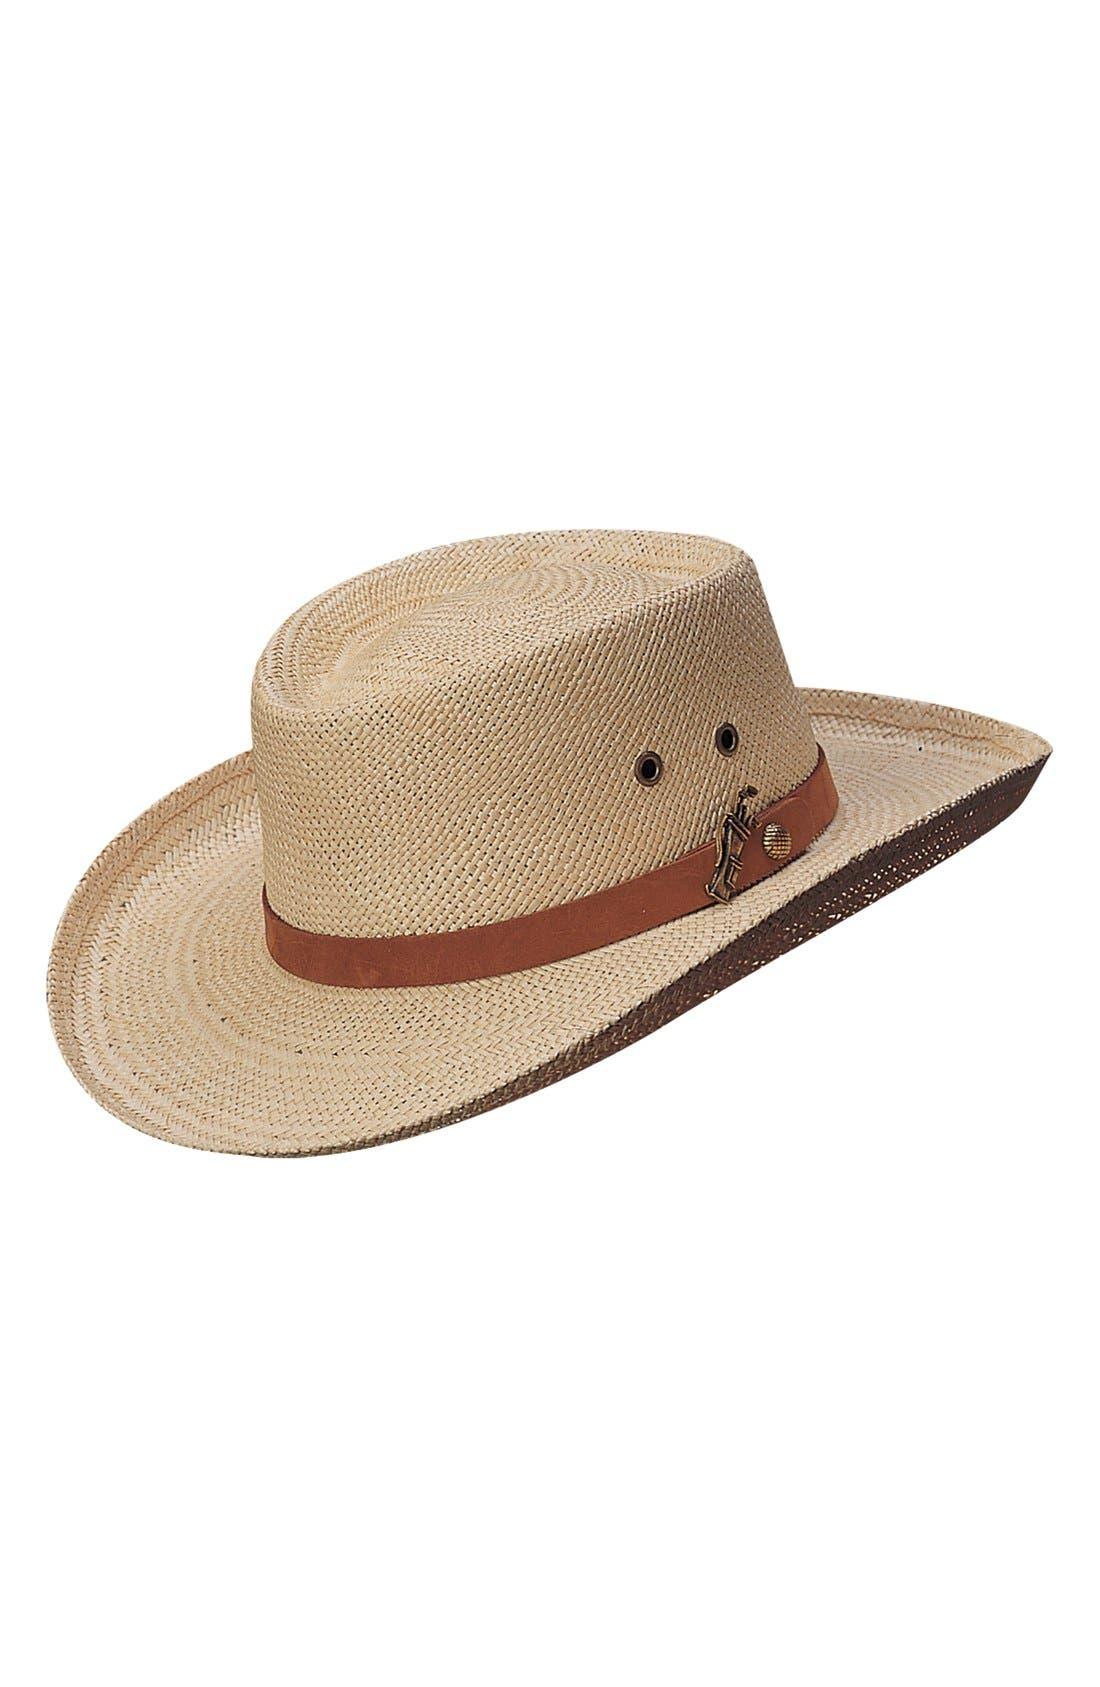 Alternate Image 1 Selected - Scala Palm Gambler Hat